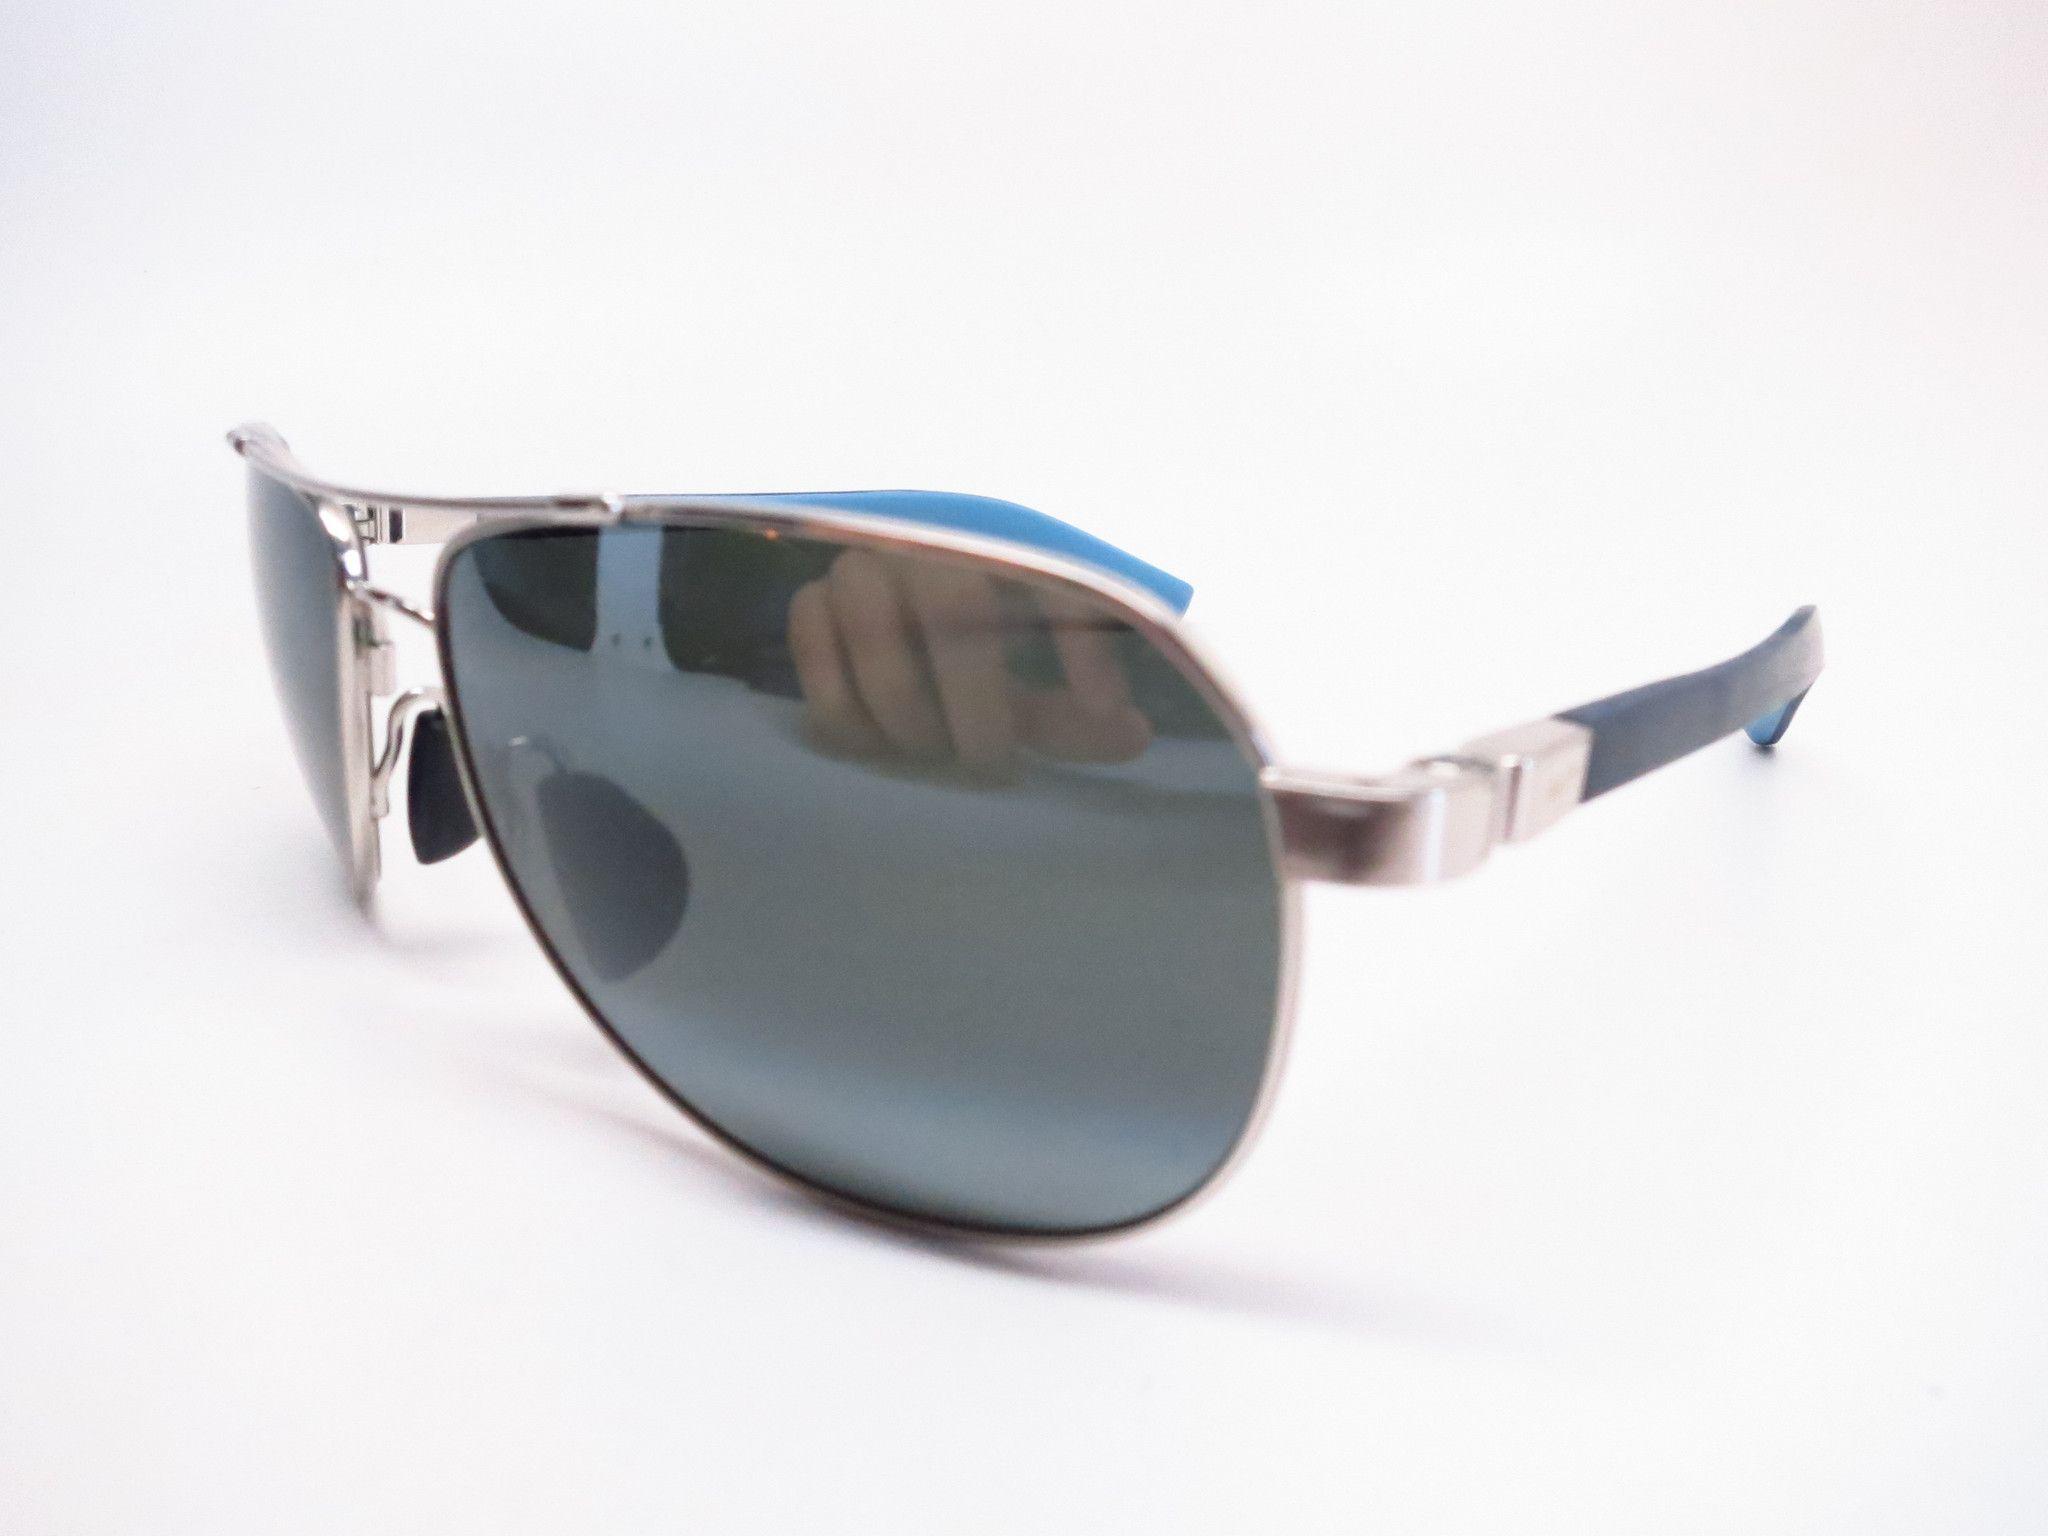 1cceaf762e Maui Jim Guardrails MJ 327-17 Silver with Blue   Light Blue Polarized  Sunglasses